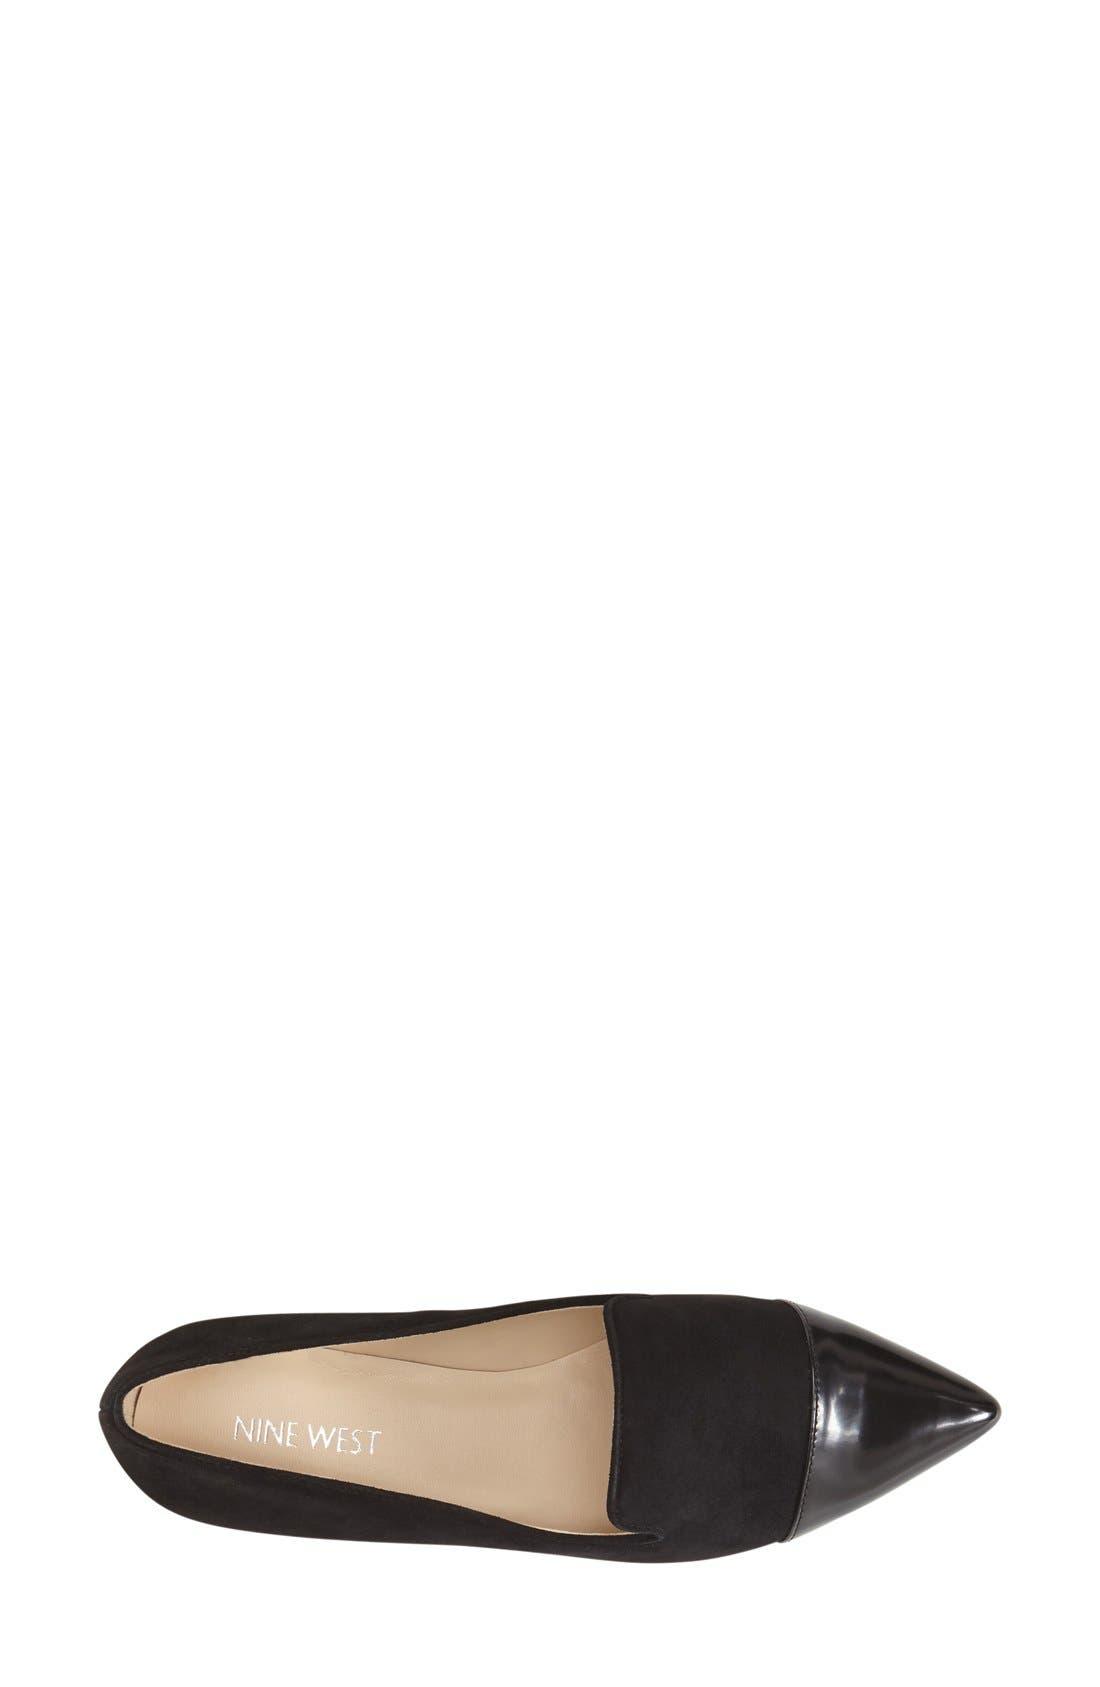 NINE WEST, 'Trainer' Cap Toe Loafer, Alternate thumbnail 3, color, 001